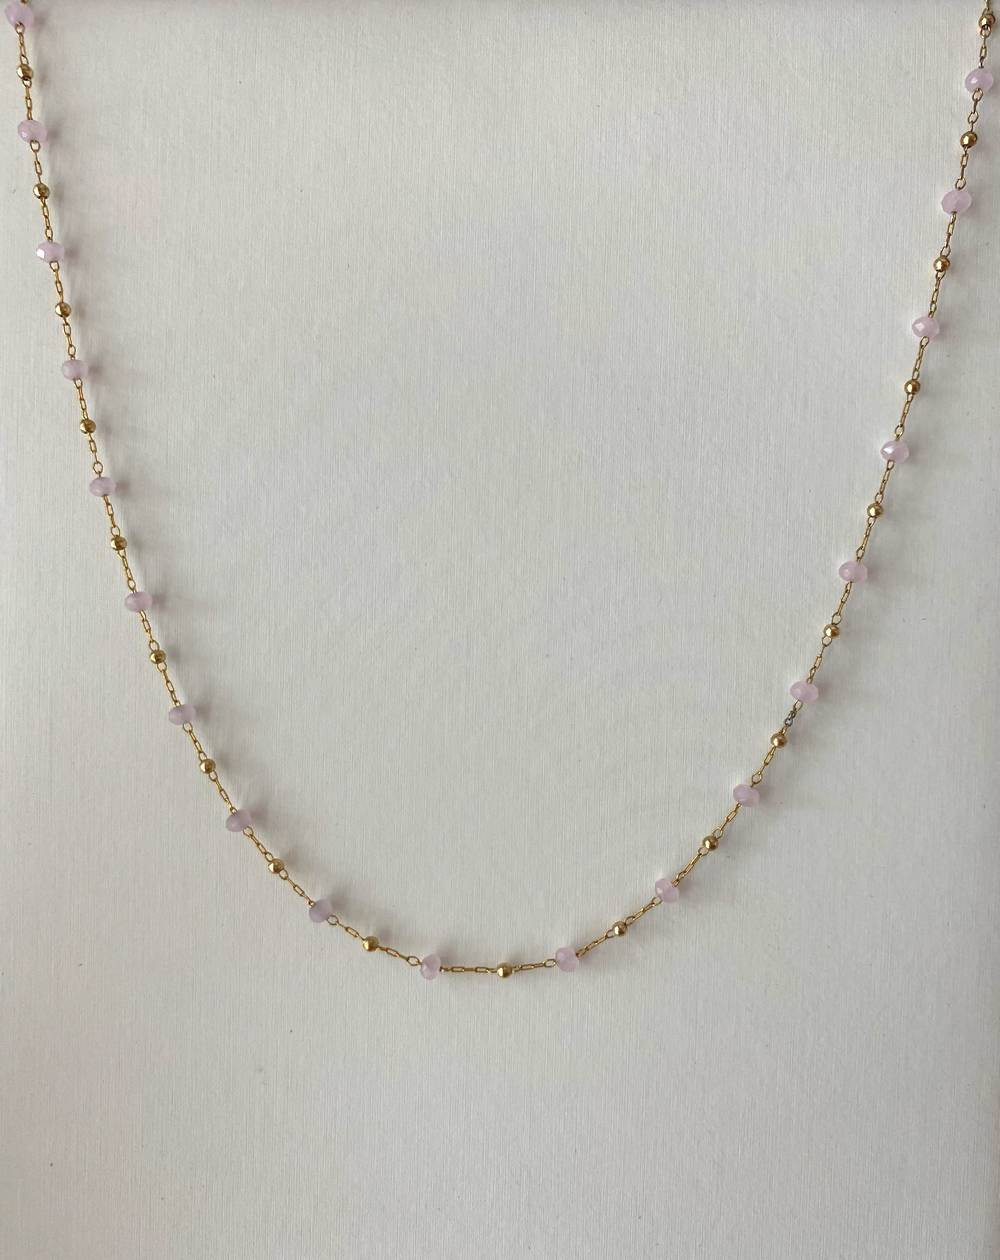 Collier chaîne doré en acier inoxydable perles roses